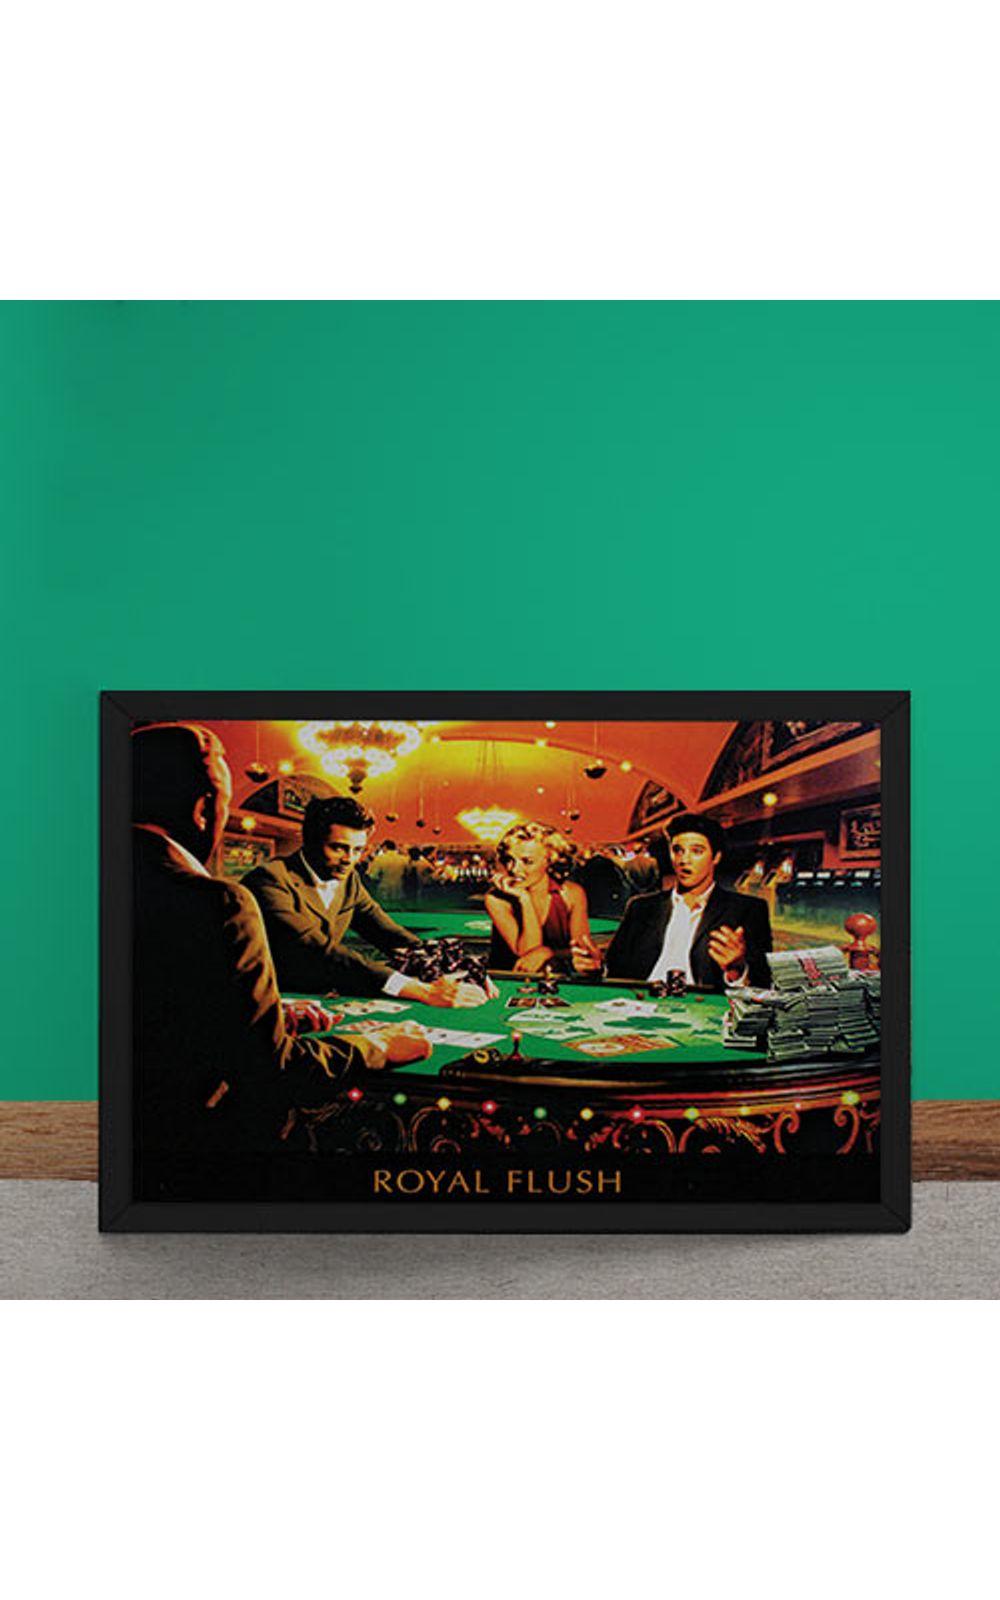 Foto 2 - Quadro Decorativo Poker Royal Flush Marylin Monroe Elvis Presley James Dean Humphrey Bogart